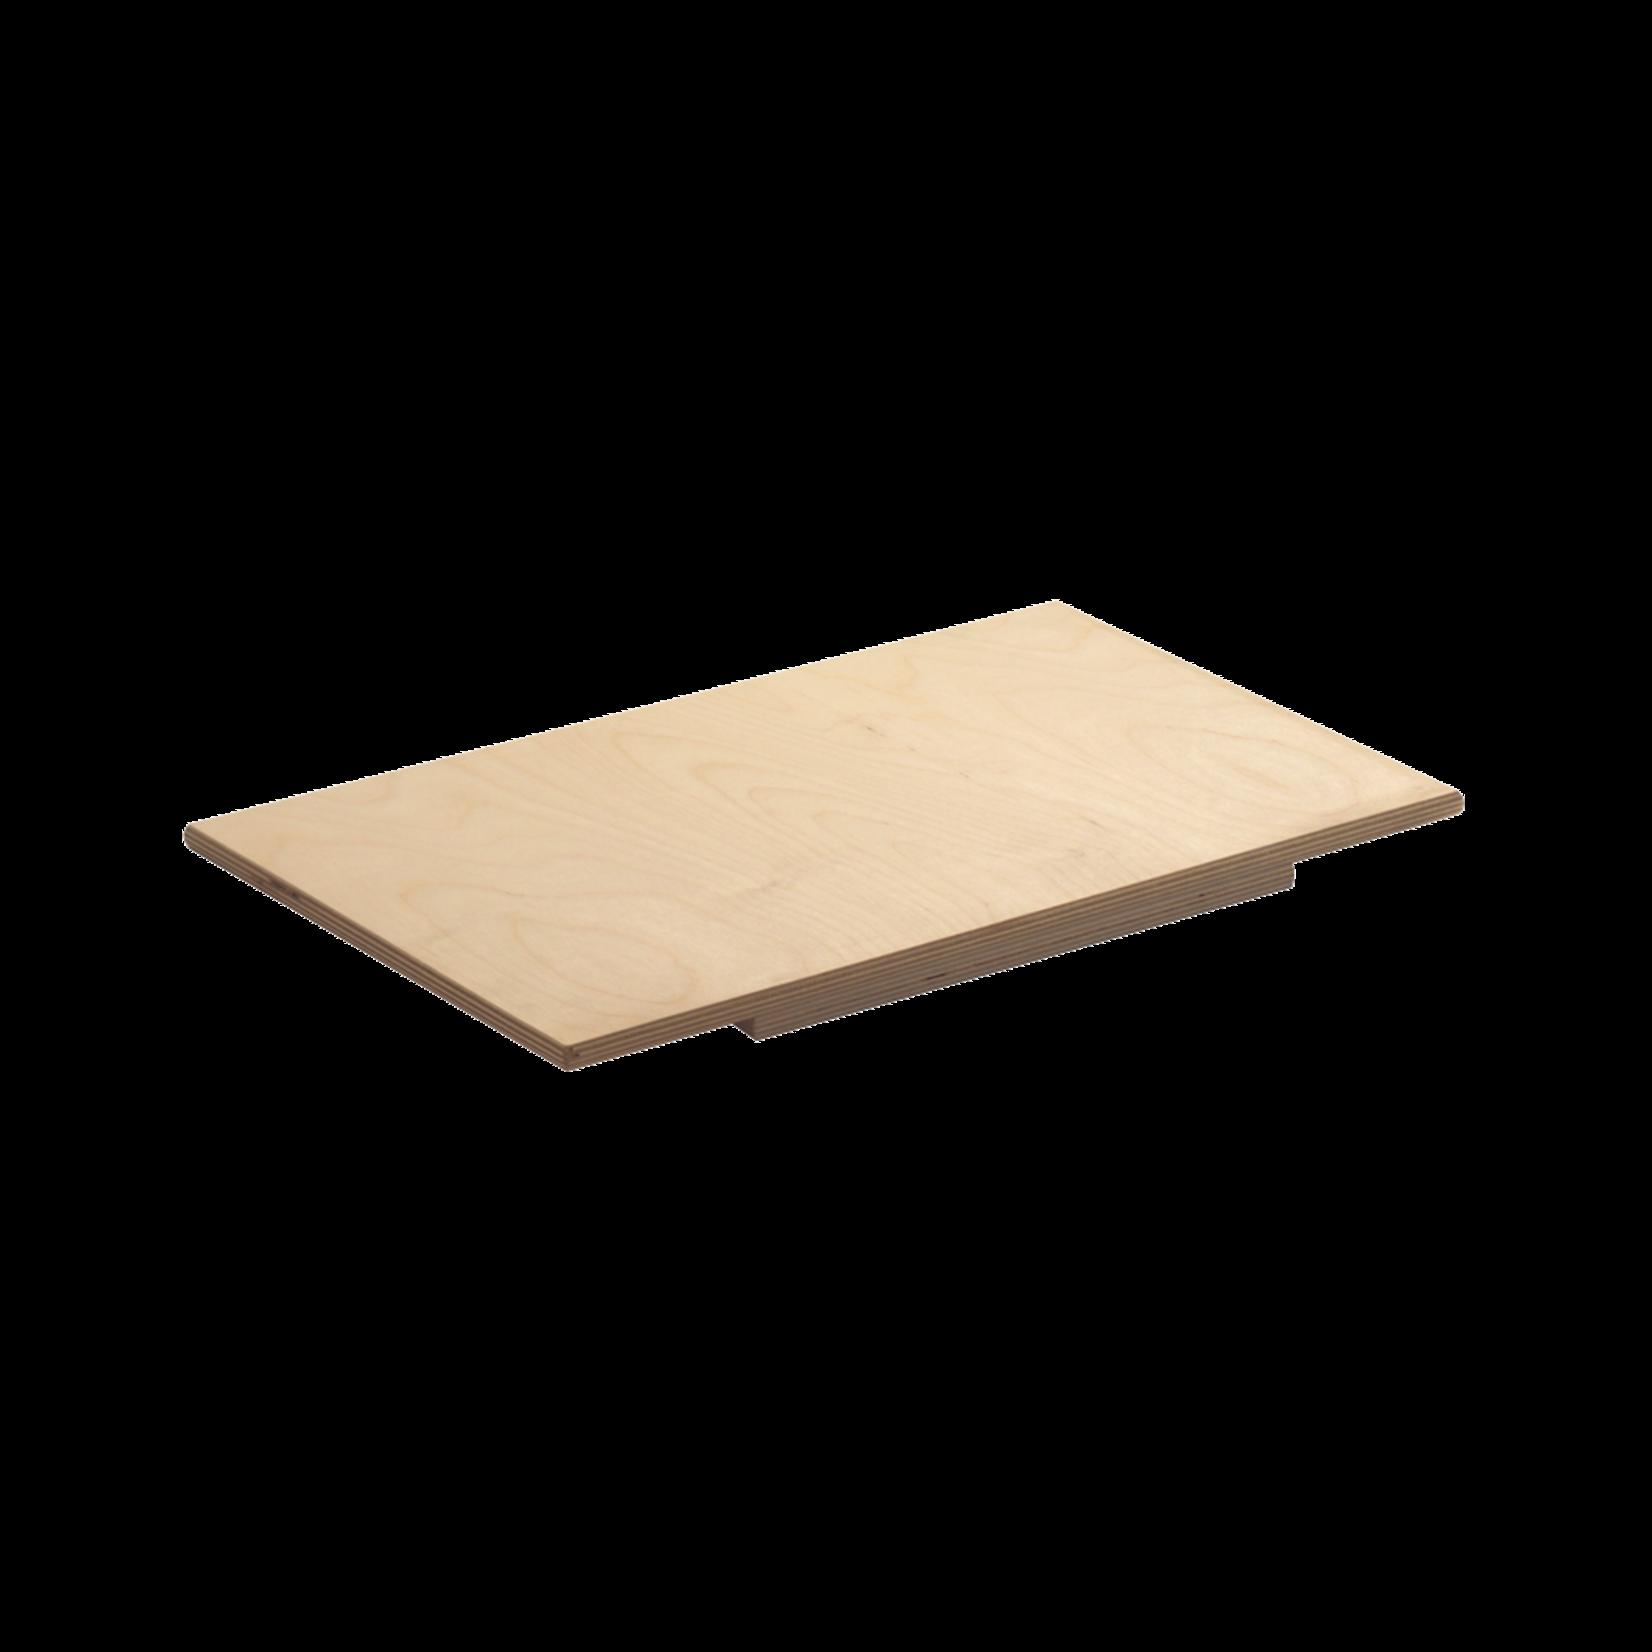 Eppicotispai Bak plank 60x100x1.2cm